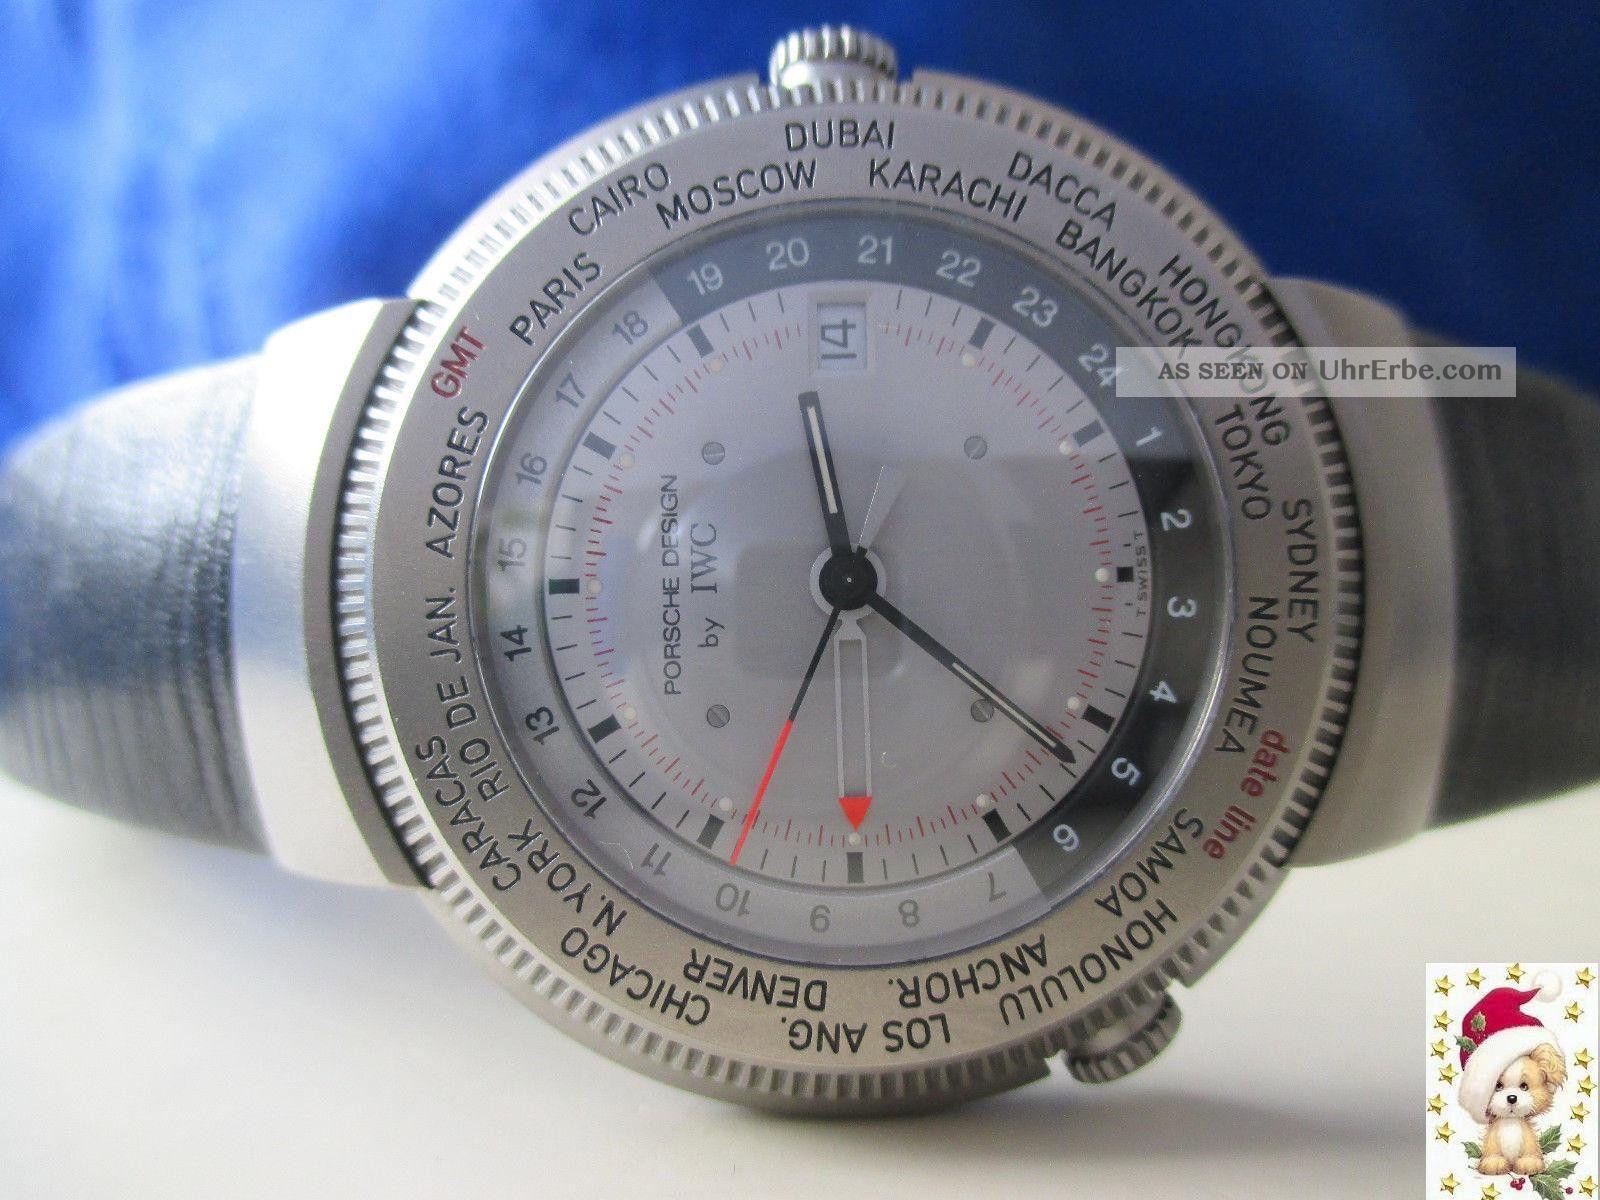 Sammleruhr Iwc Porsche Design World Timer Gmt In Titan Box Armbanduhren Bild